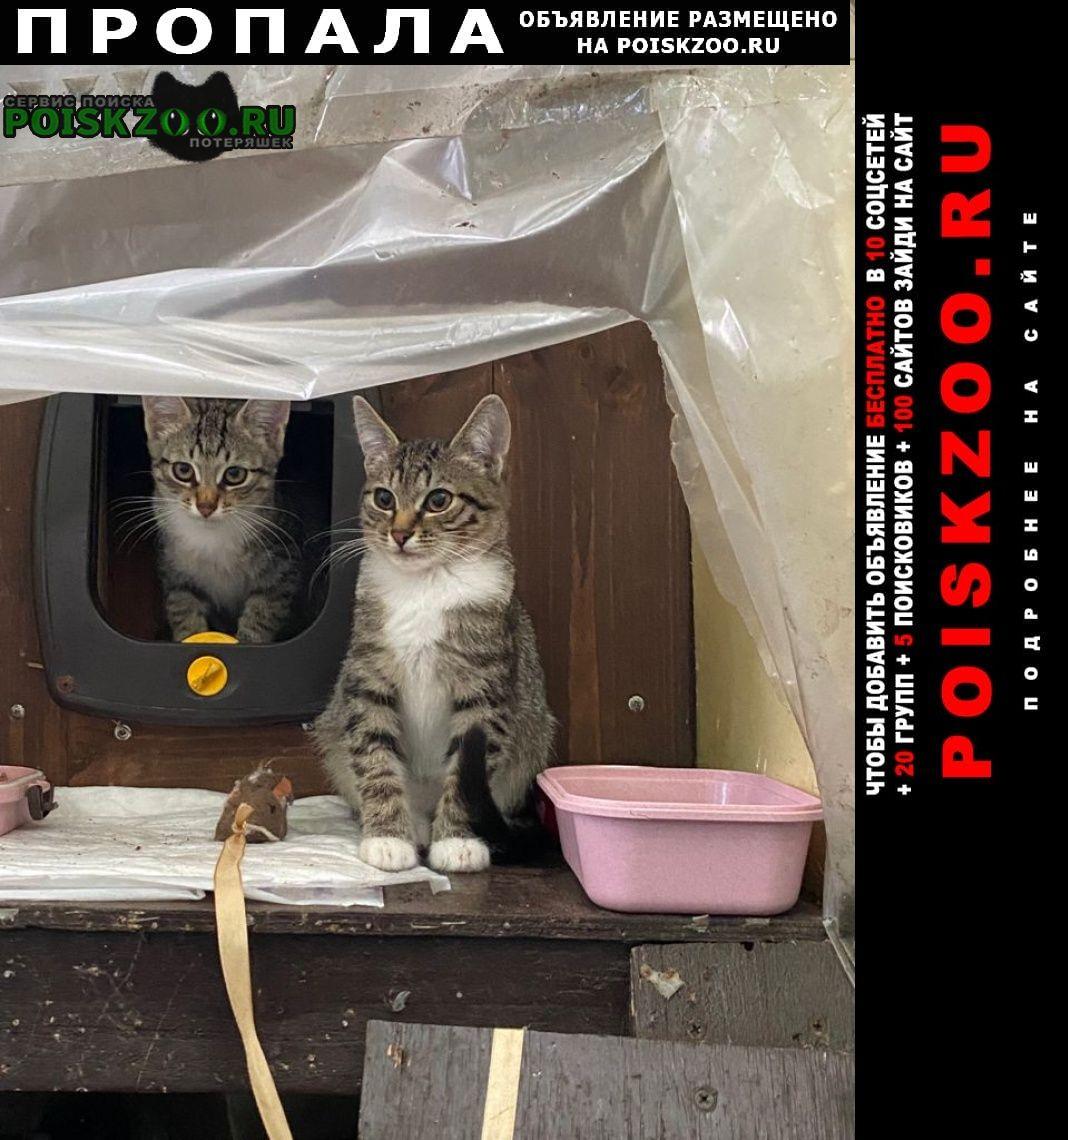 Москва Пропал кот